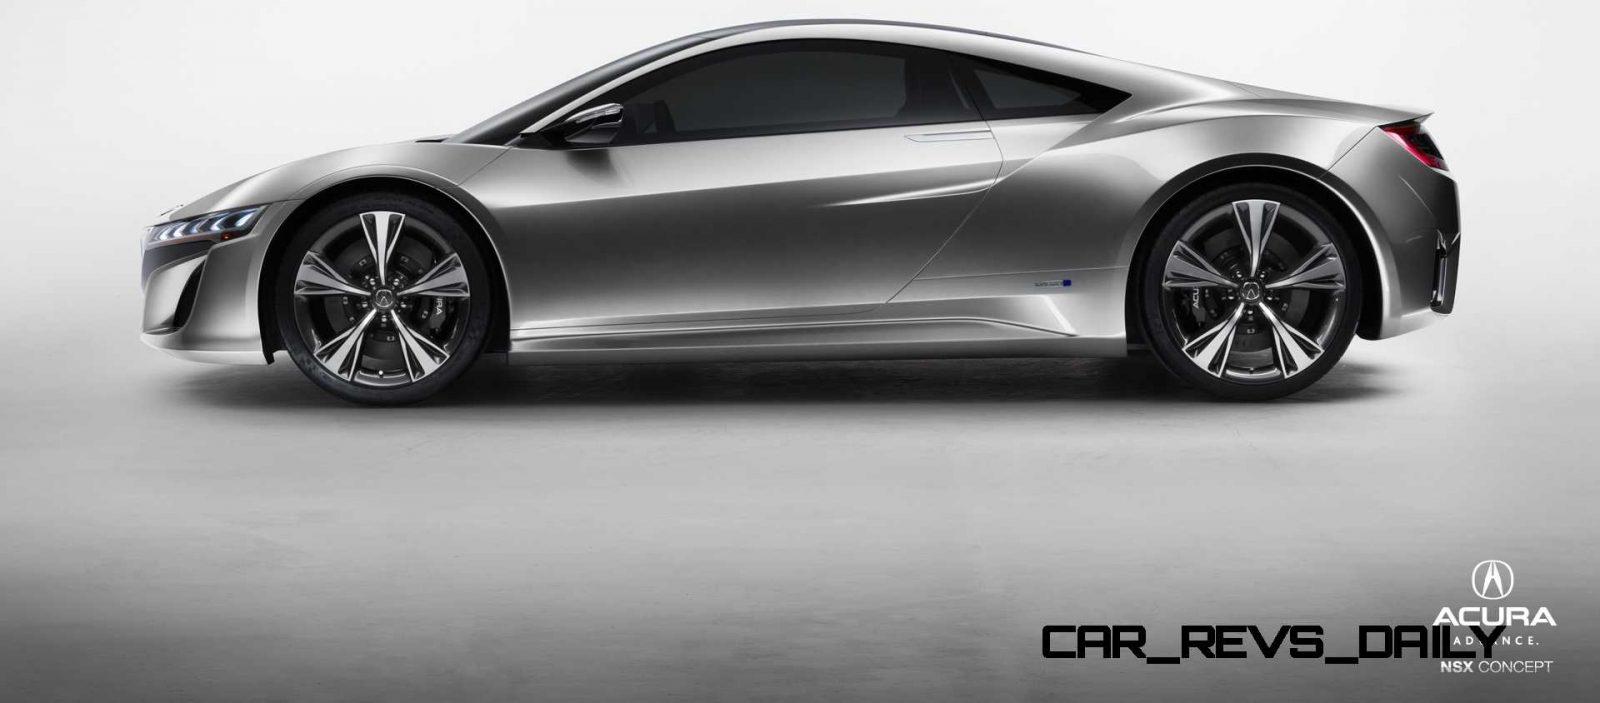 Acura-NSX-concept-5